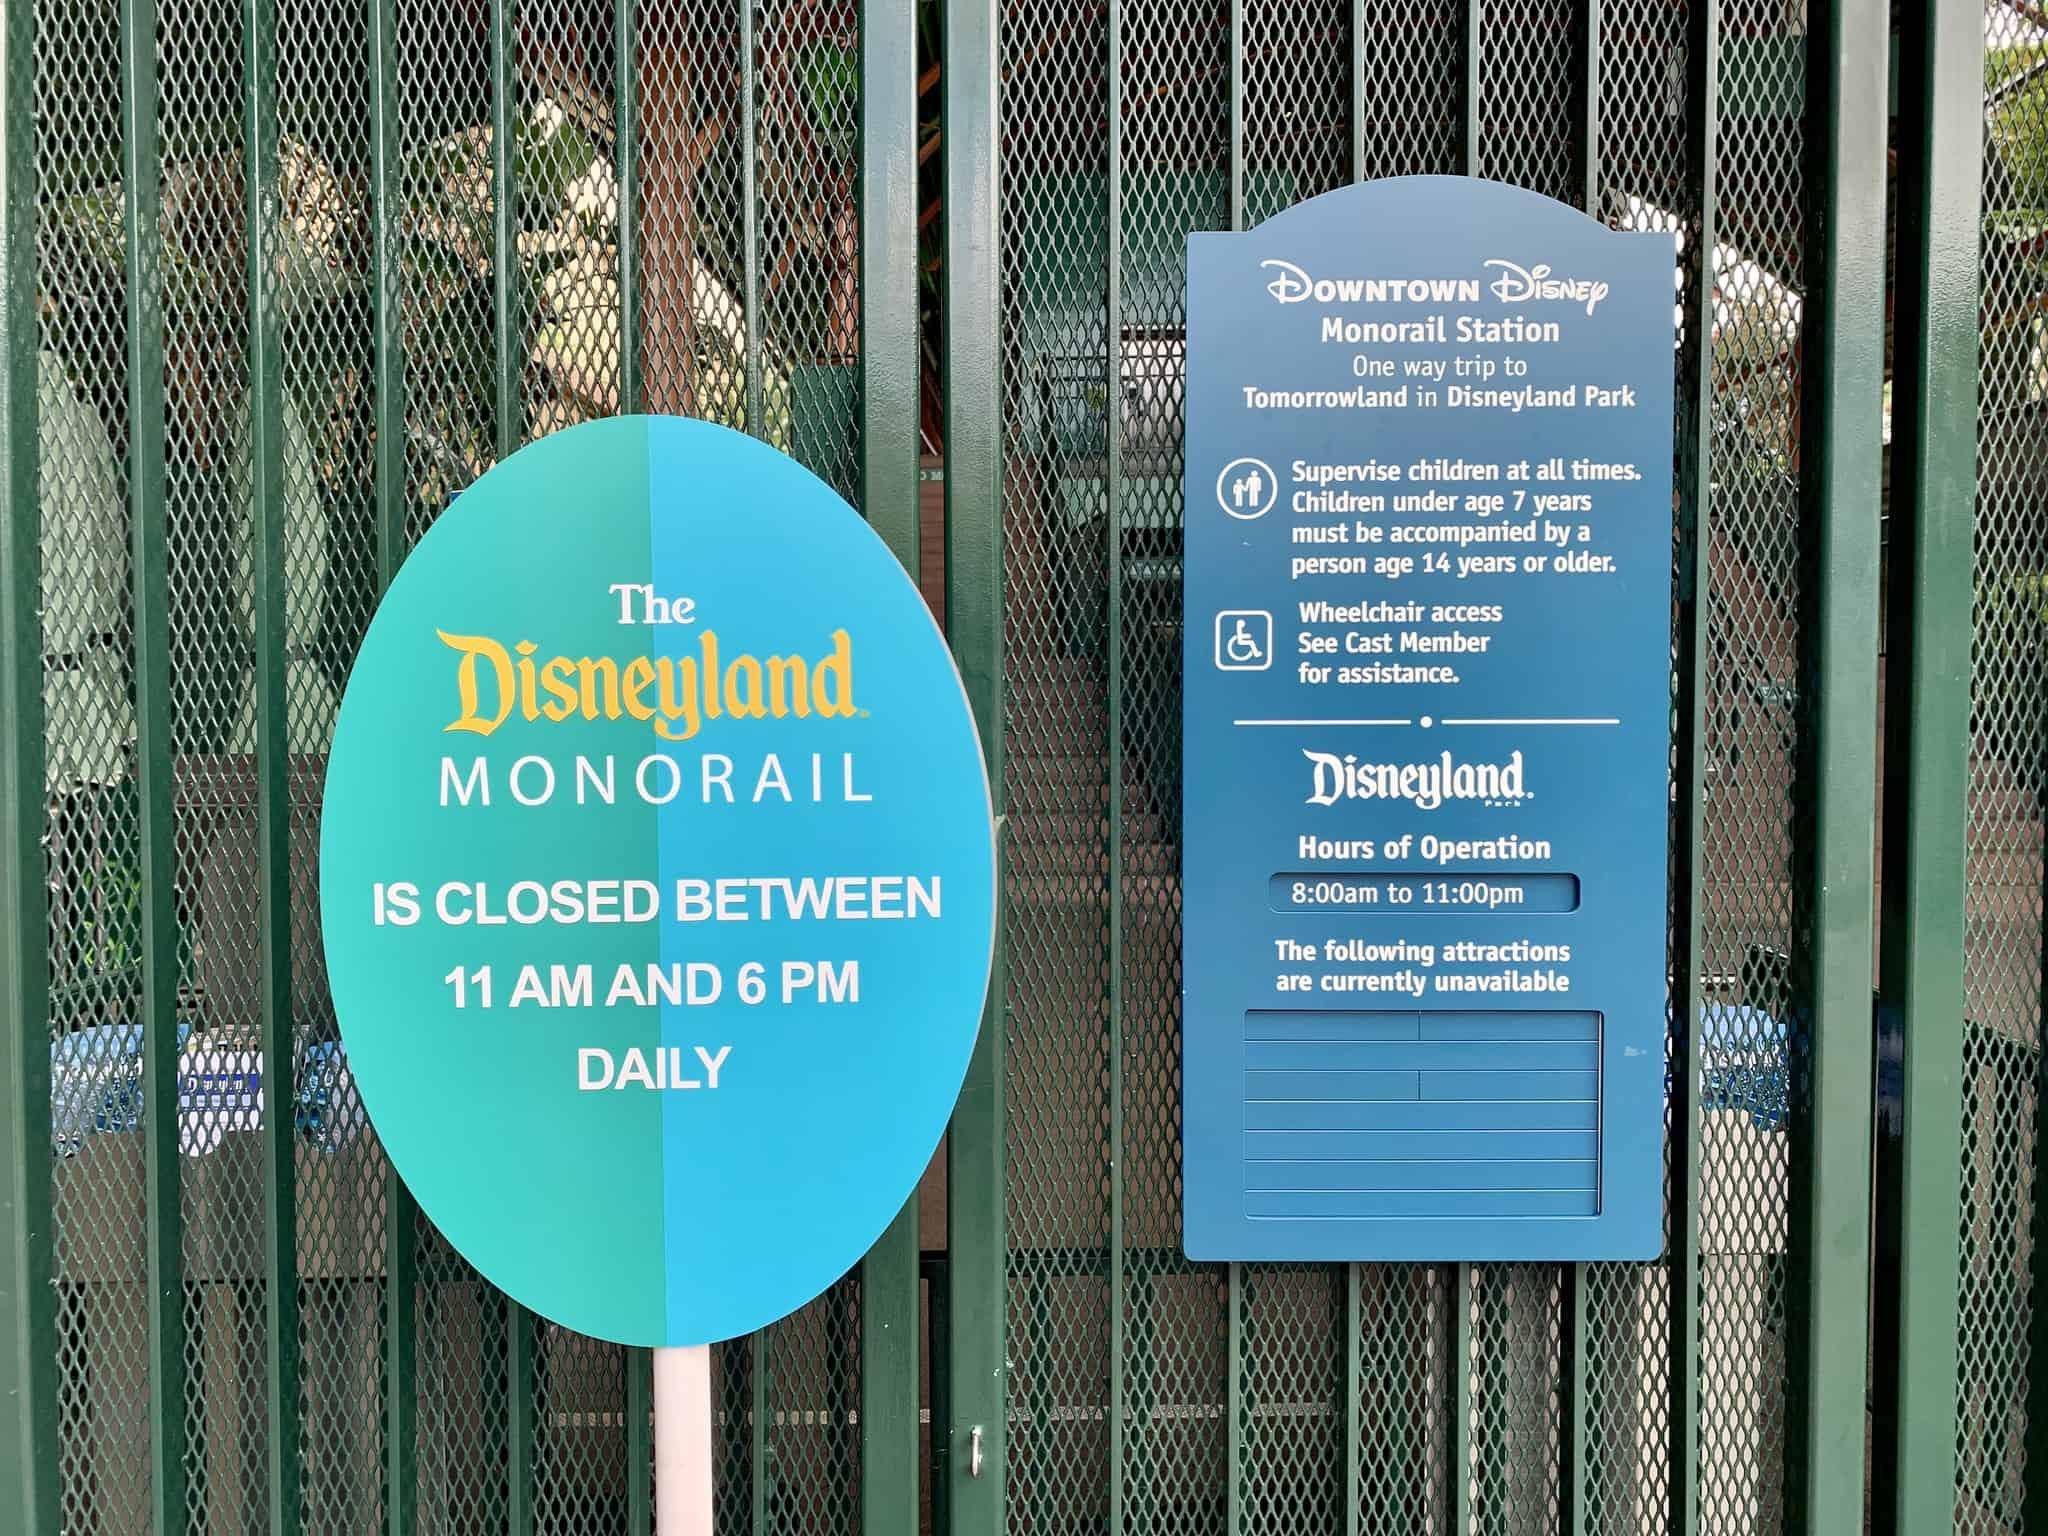 Disneyland Monorail Reduced Hours Disneyland Resort